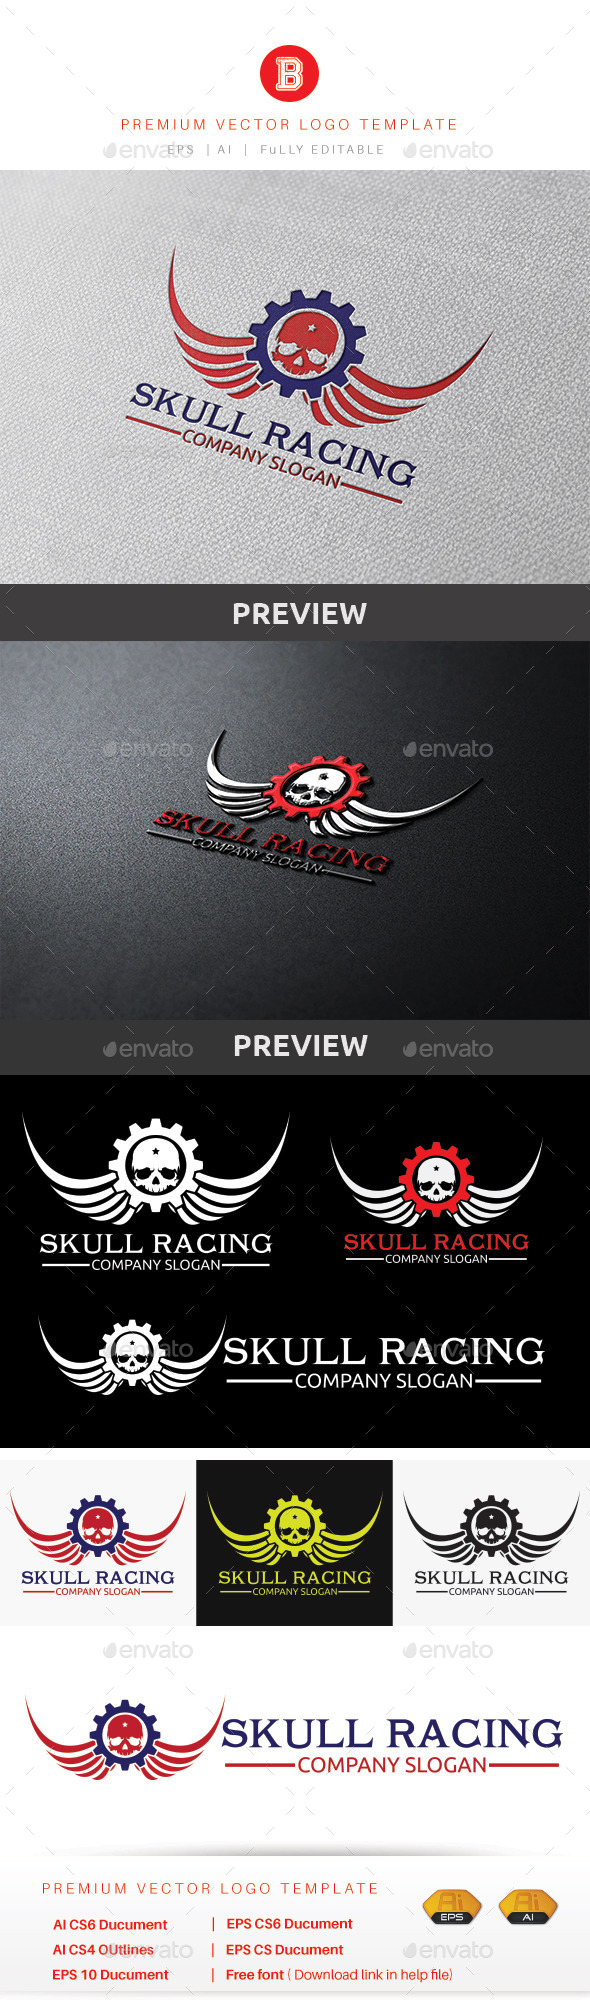 Skull Racing